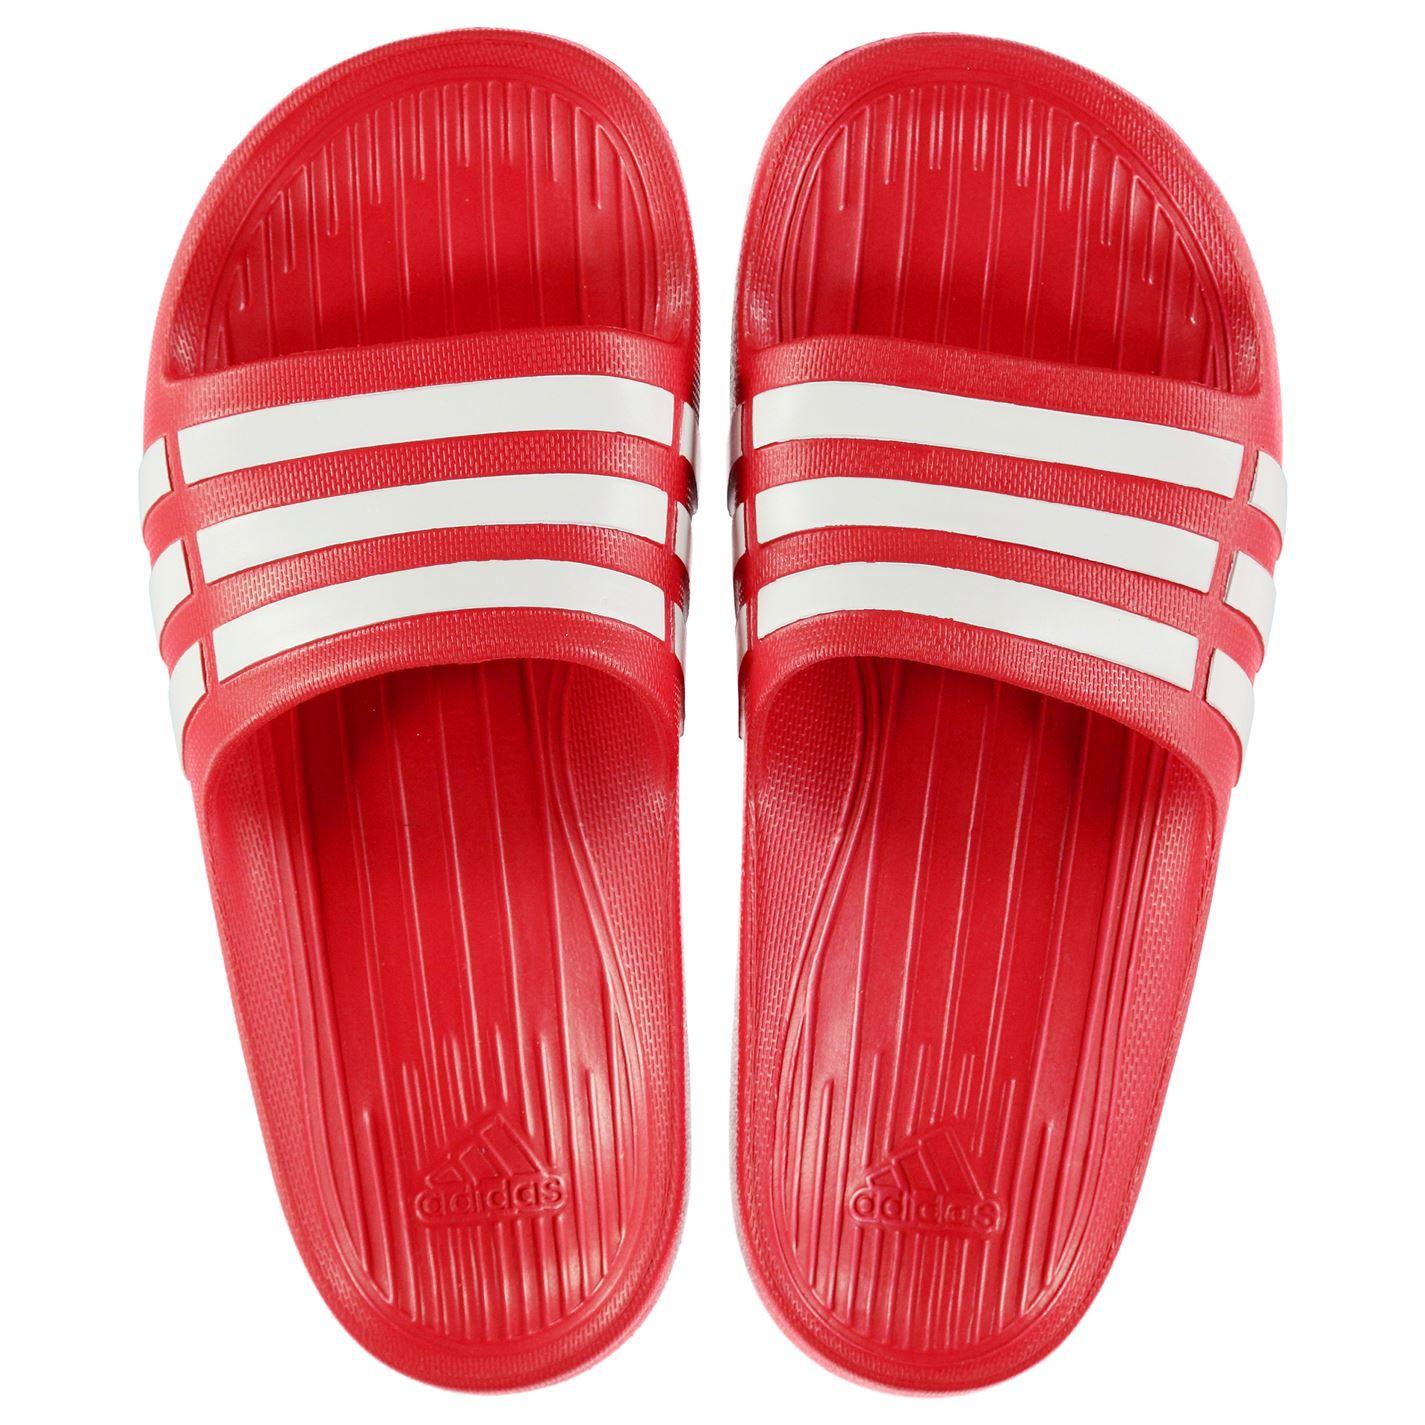 super popular 878d8 f54ea adidas-Kids-Boys-Duramo-Slide-Pool-Shoes-Slip-